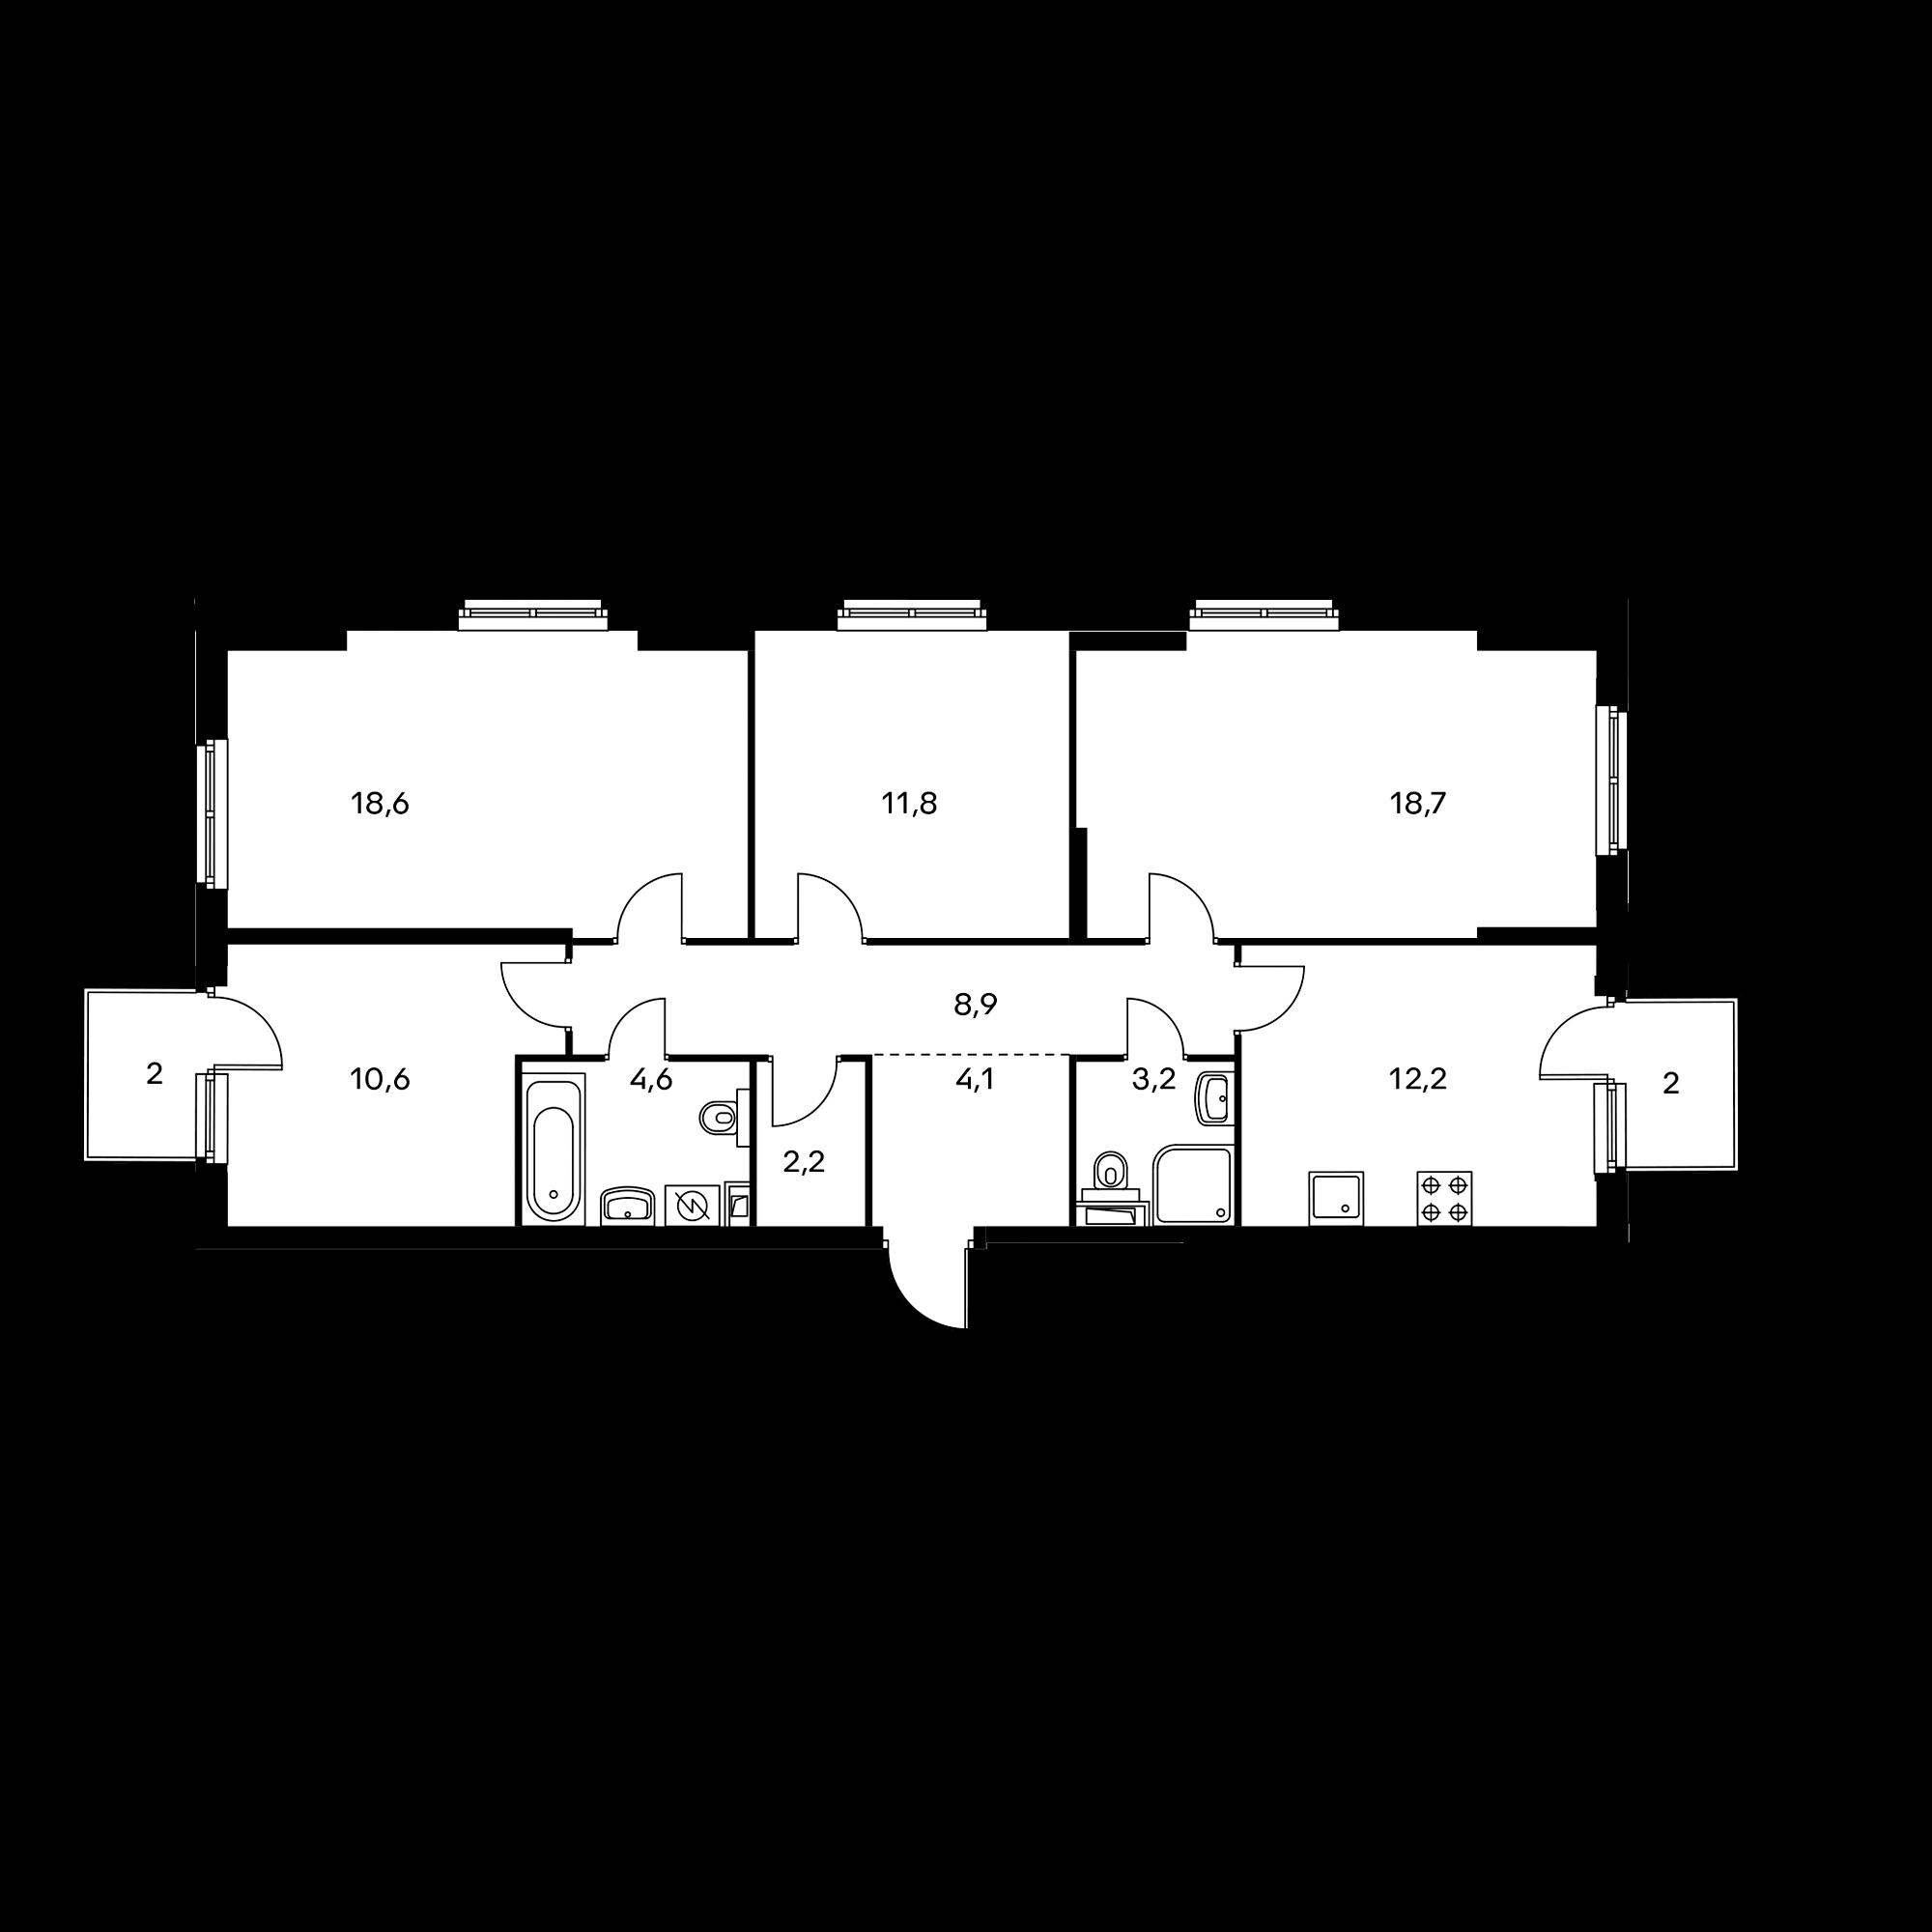 4KM2_6.6-1B2